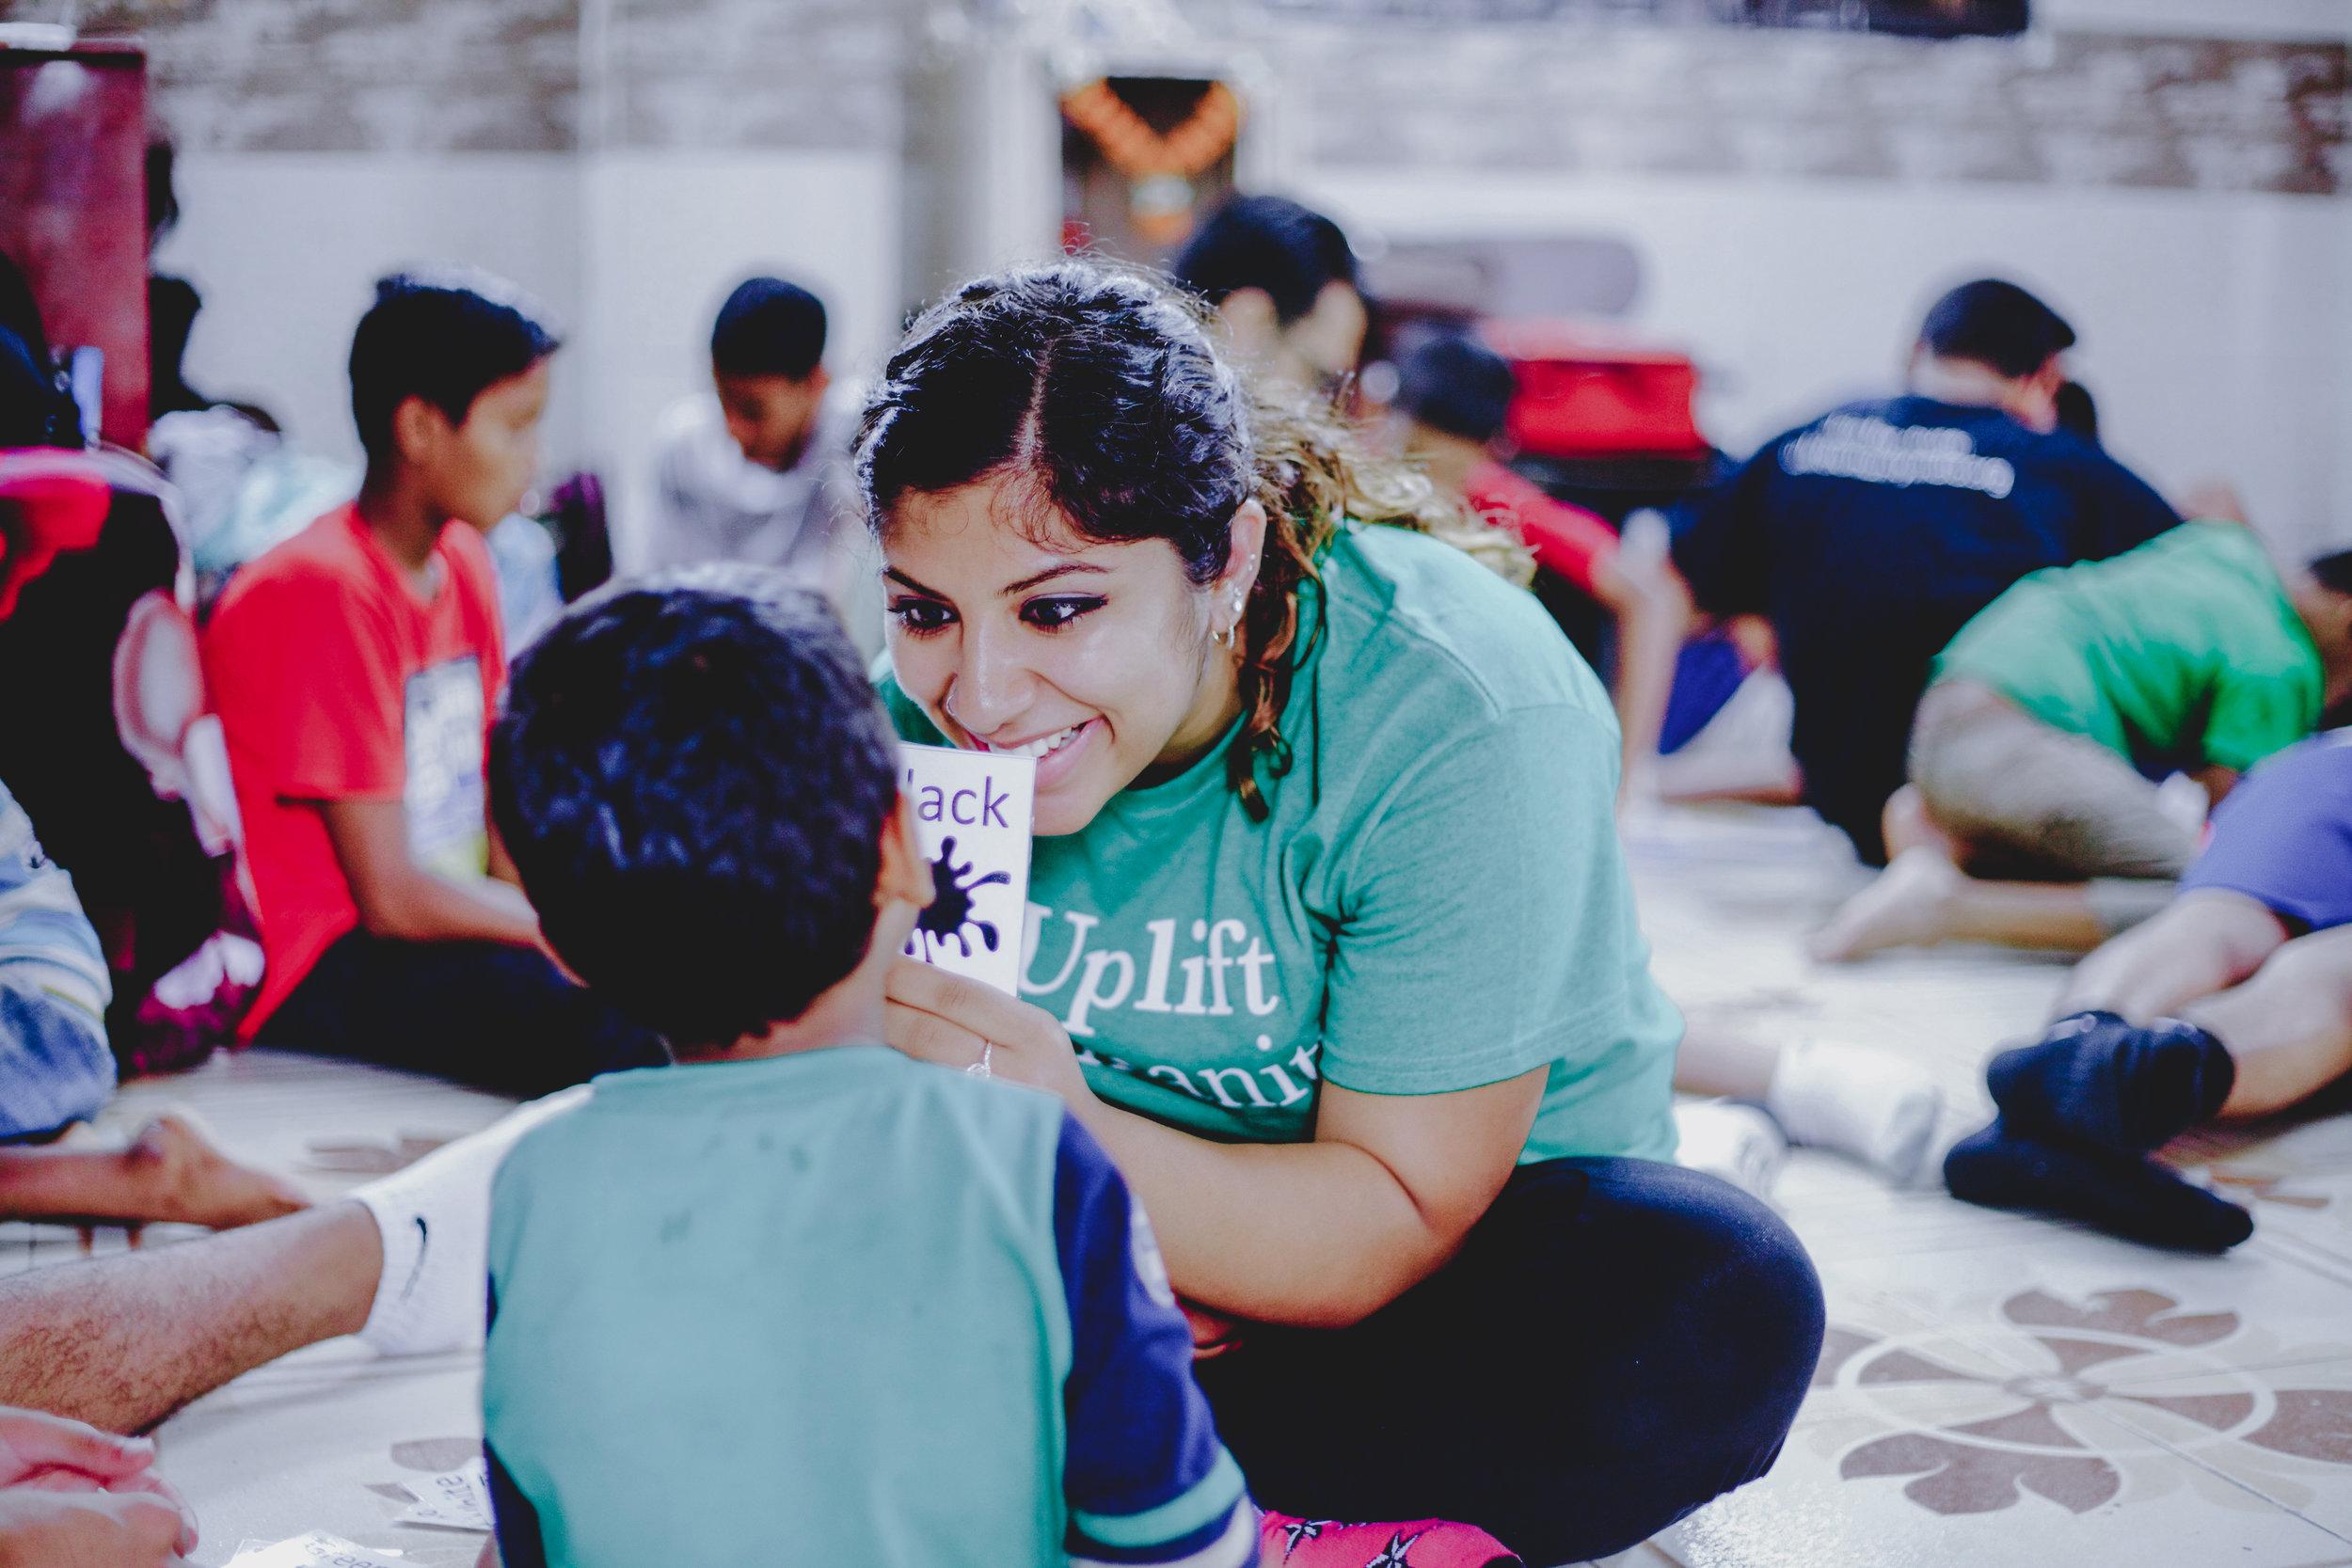 Anish Patil Uplift Humanity ArtShouldTempt Picture 7